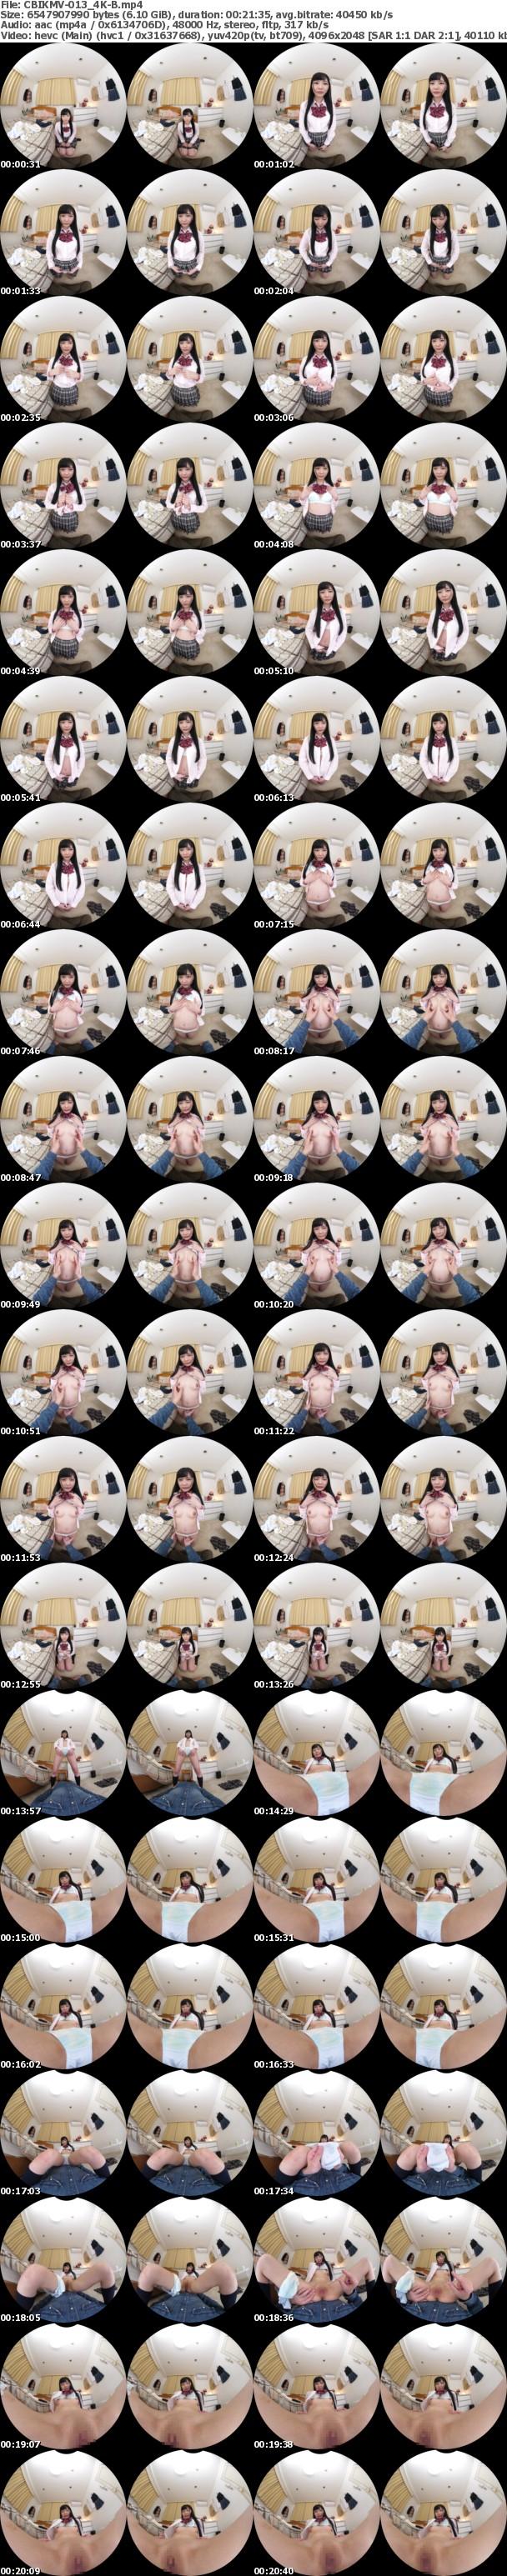 (VR) (4K) CBIKMV-013 玄関を開けると隣に住む女子校生 困っているので、携帯の充電器を貸してあげると「今度、お礼させてください」と言われ、両親がいない夜、彼女の部屋に… 超早漏 'ビクンッビクンッ'パイパンま○こに追撃中出し